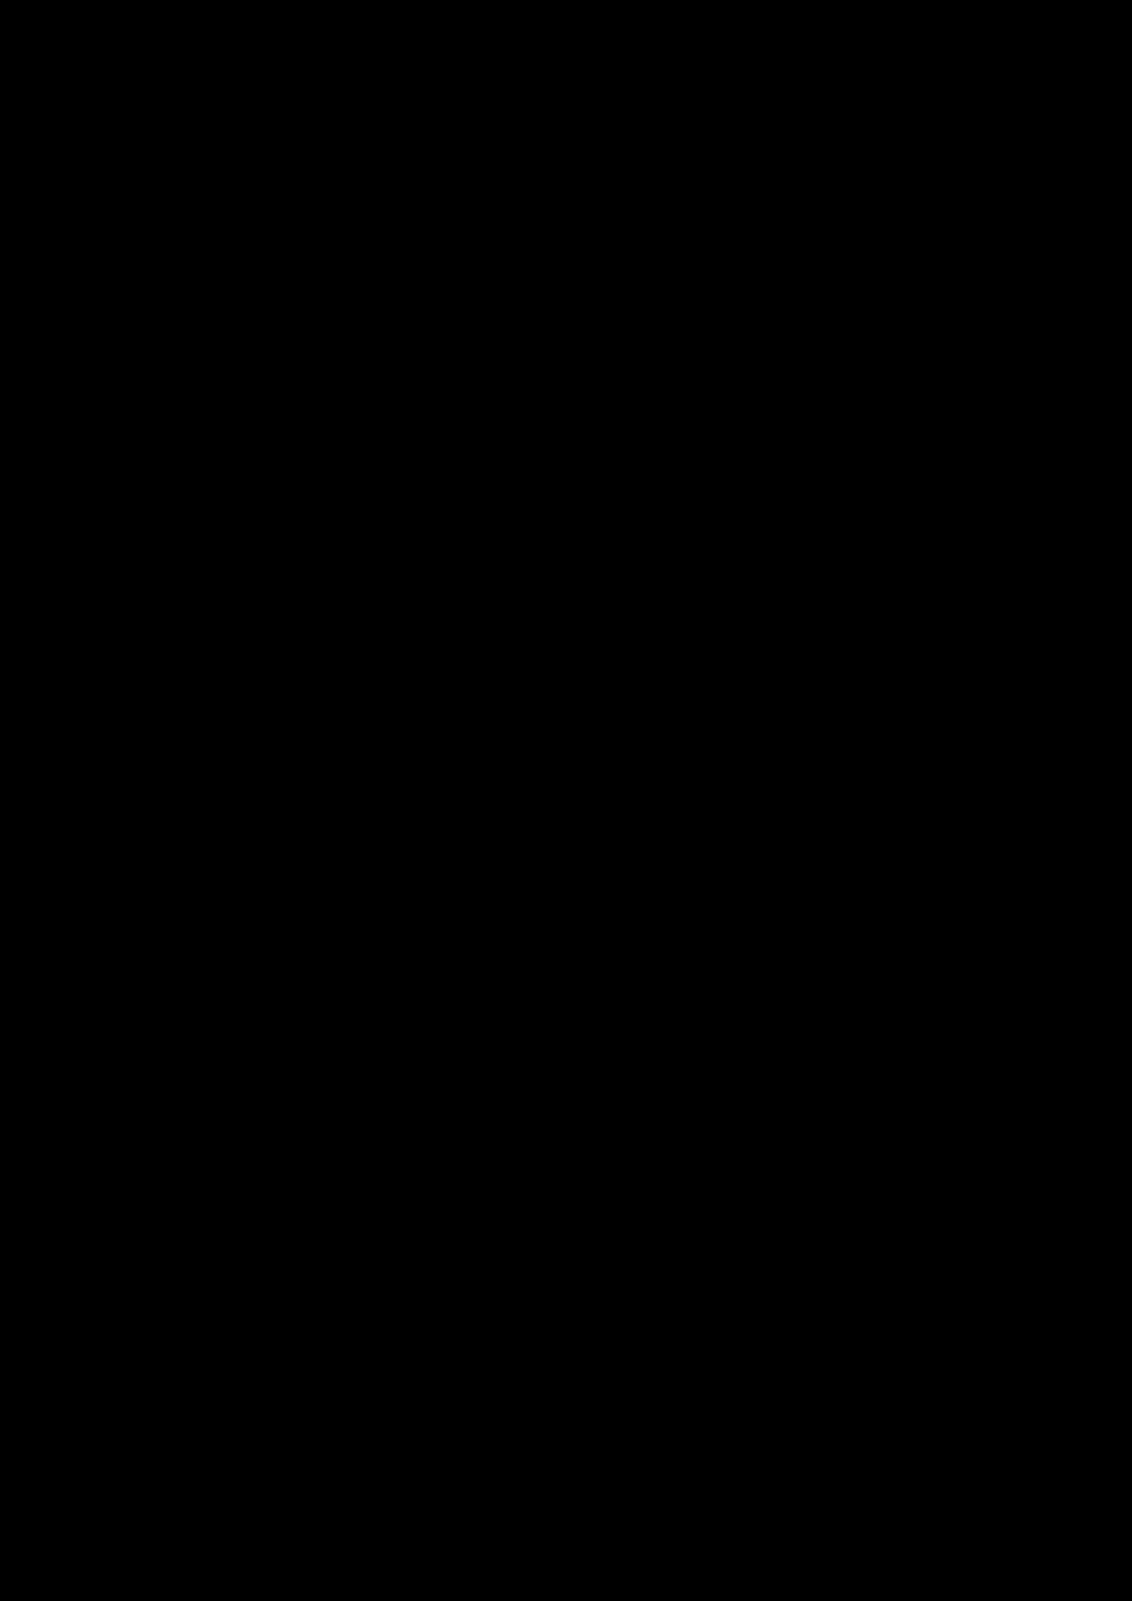 Ten lyubvi slide, Image 19